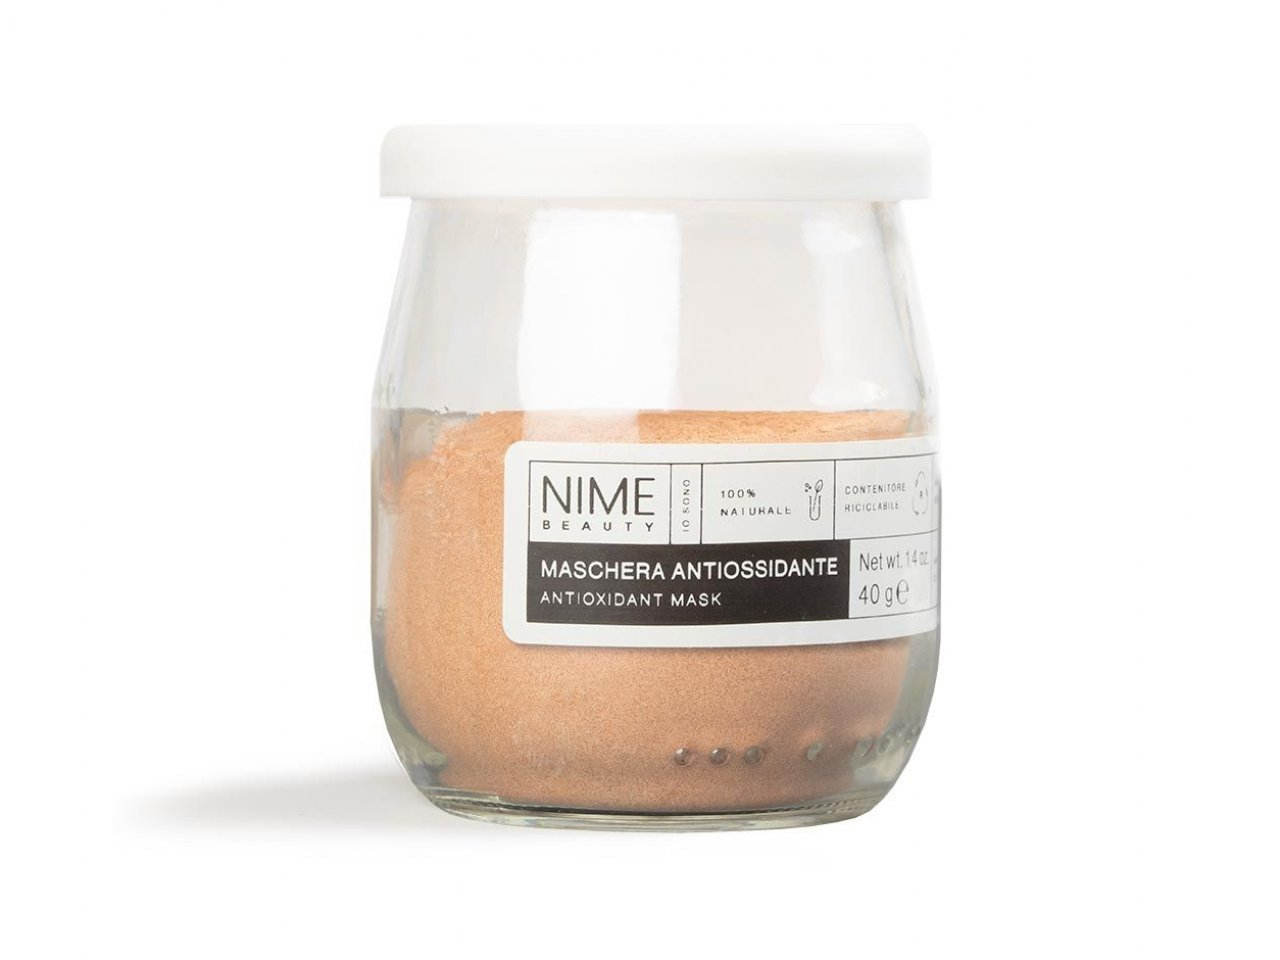 http://nimebeauty.it/maschera-viso-in-polvere-antiossidante